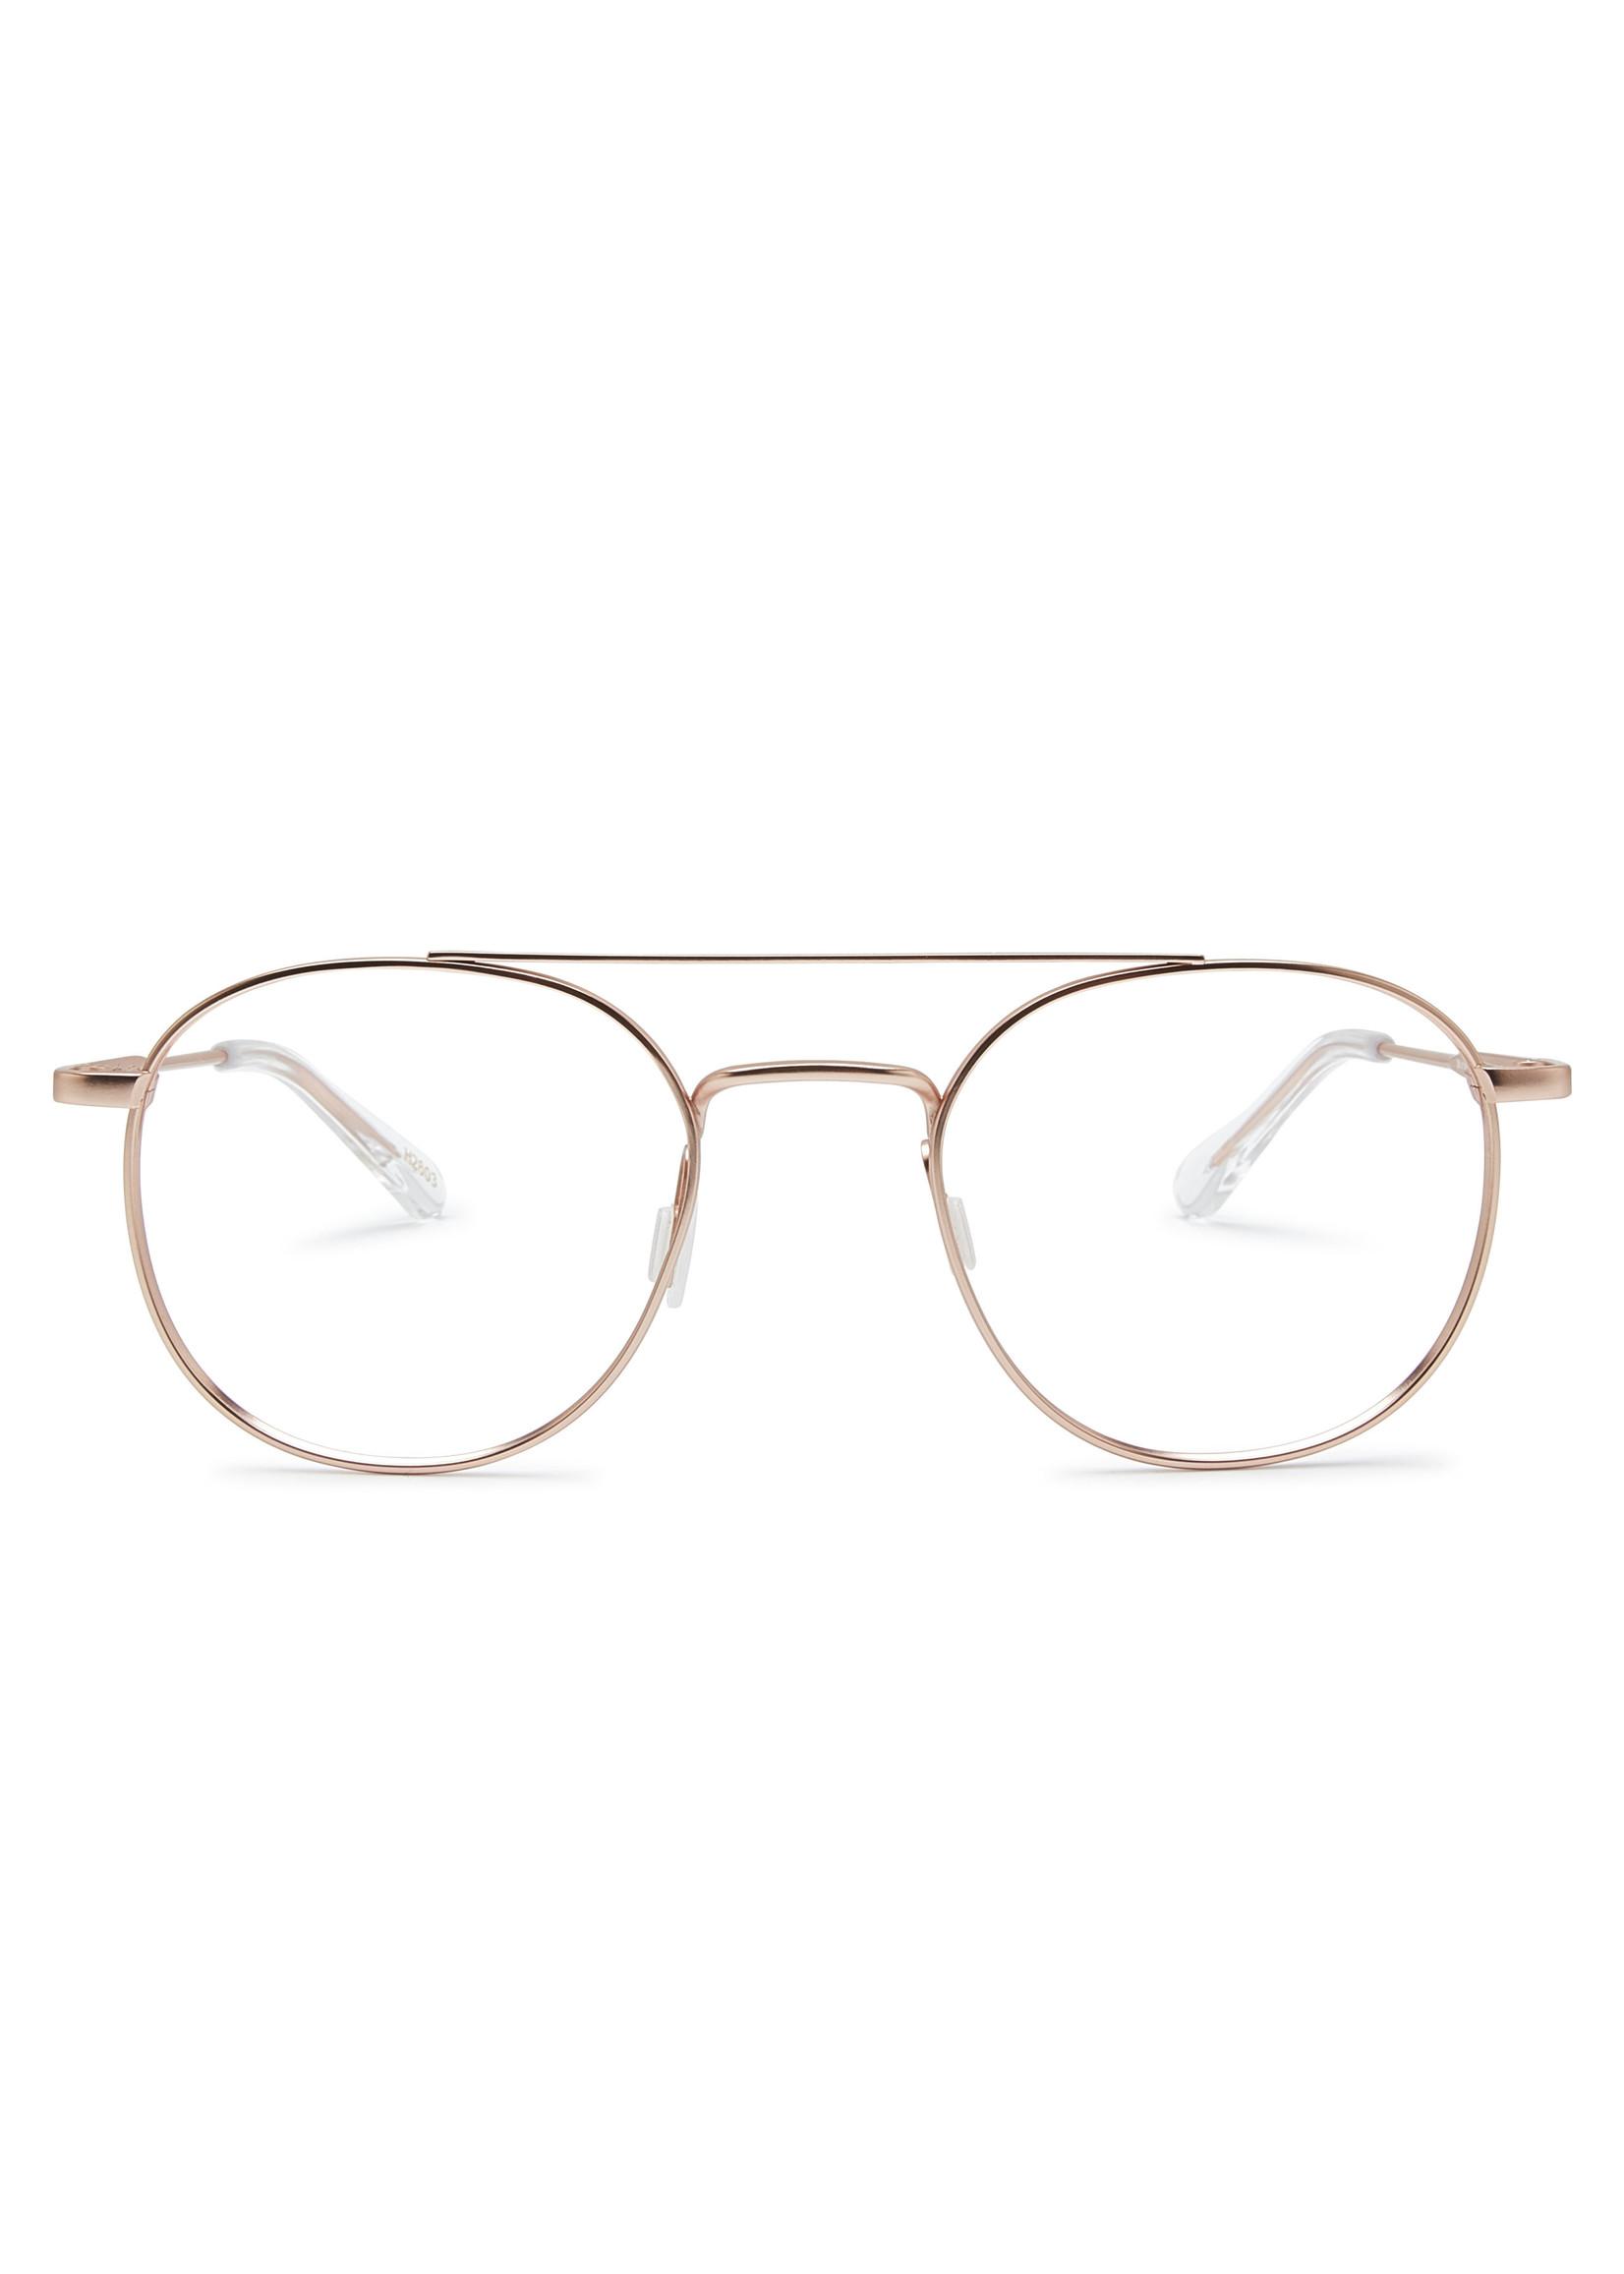 Heyelander Design Brillen  Heyelander Desigh Leesbril Ian Titanium in light gold - Copy